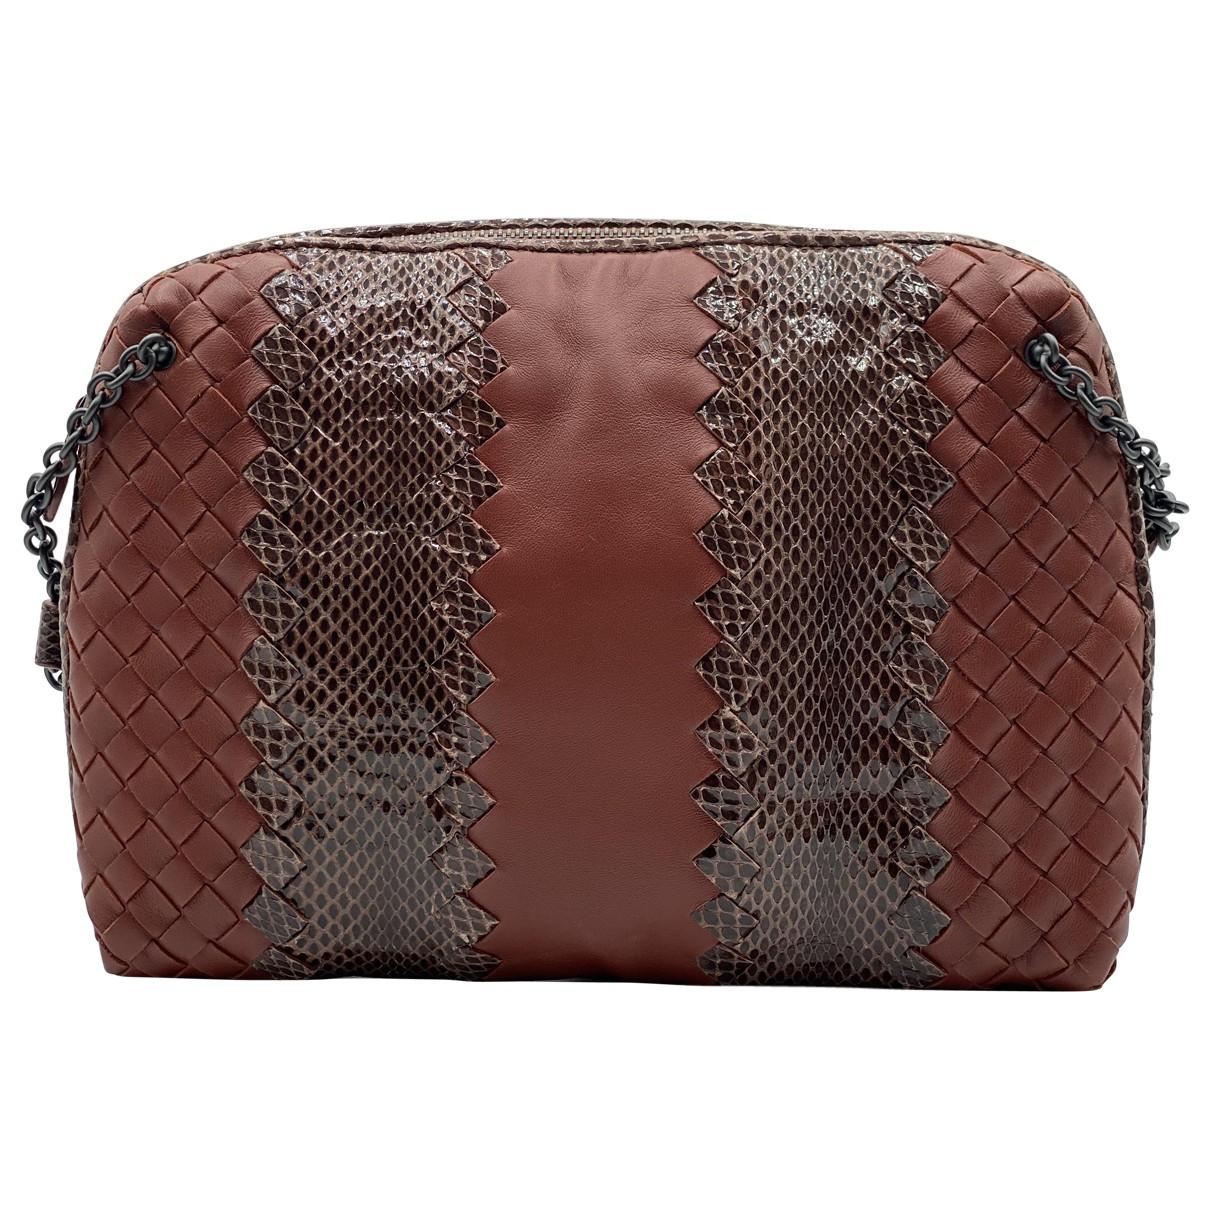 Bottega Veneta Nodini Burgundy Leather handbag for Women \N